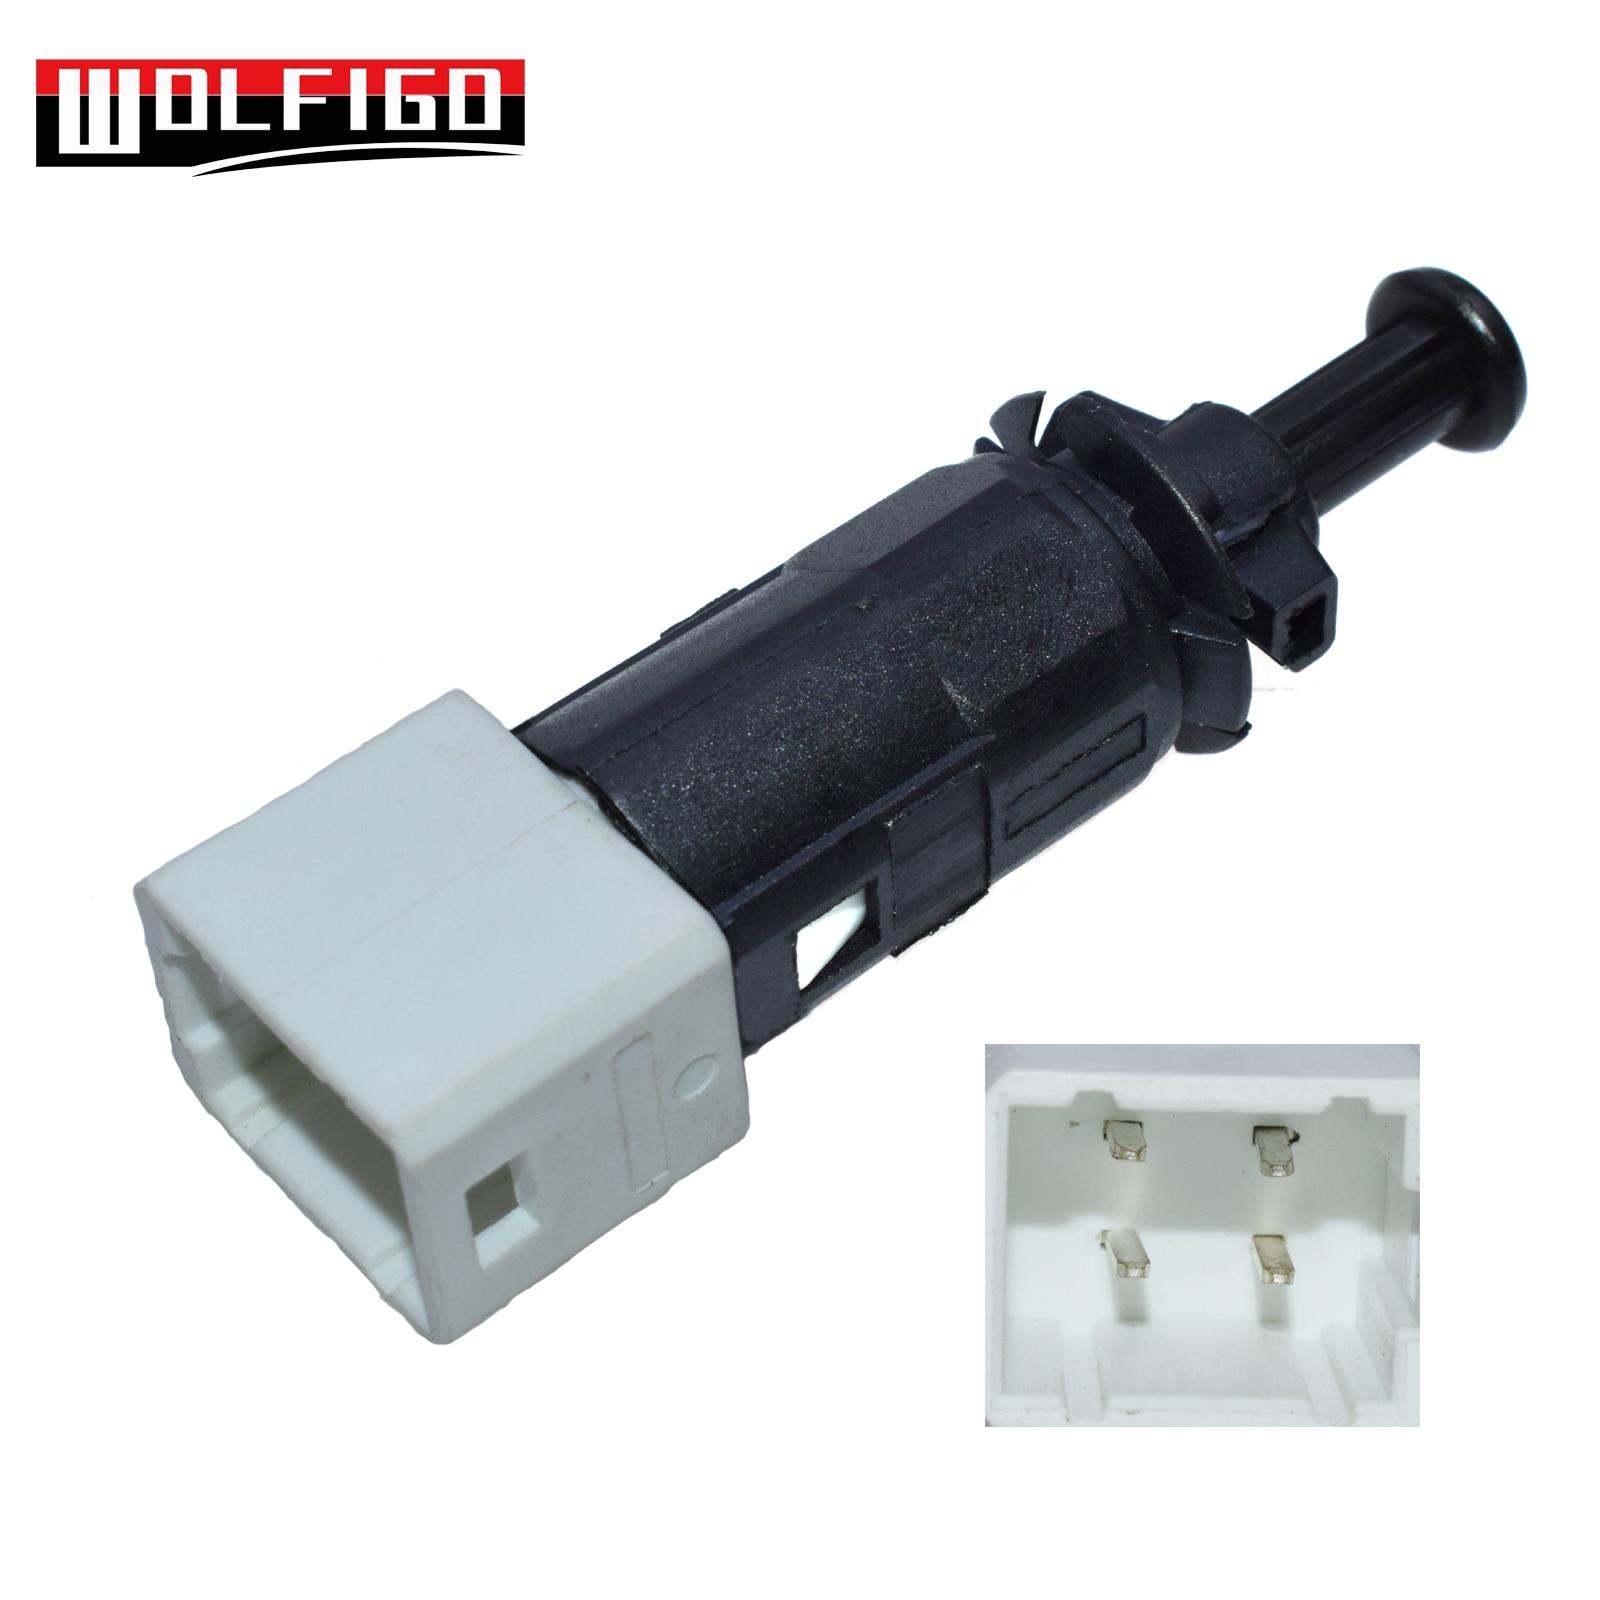 WOLFIGO New Ignition Lock Cylinder w//Key US617L For Hyundai Accent 1.6L I4 2005 2006 2007 2008 2009 2010 2011